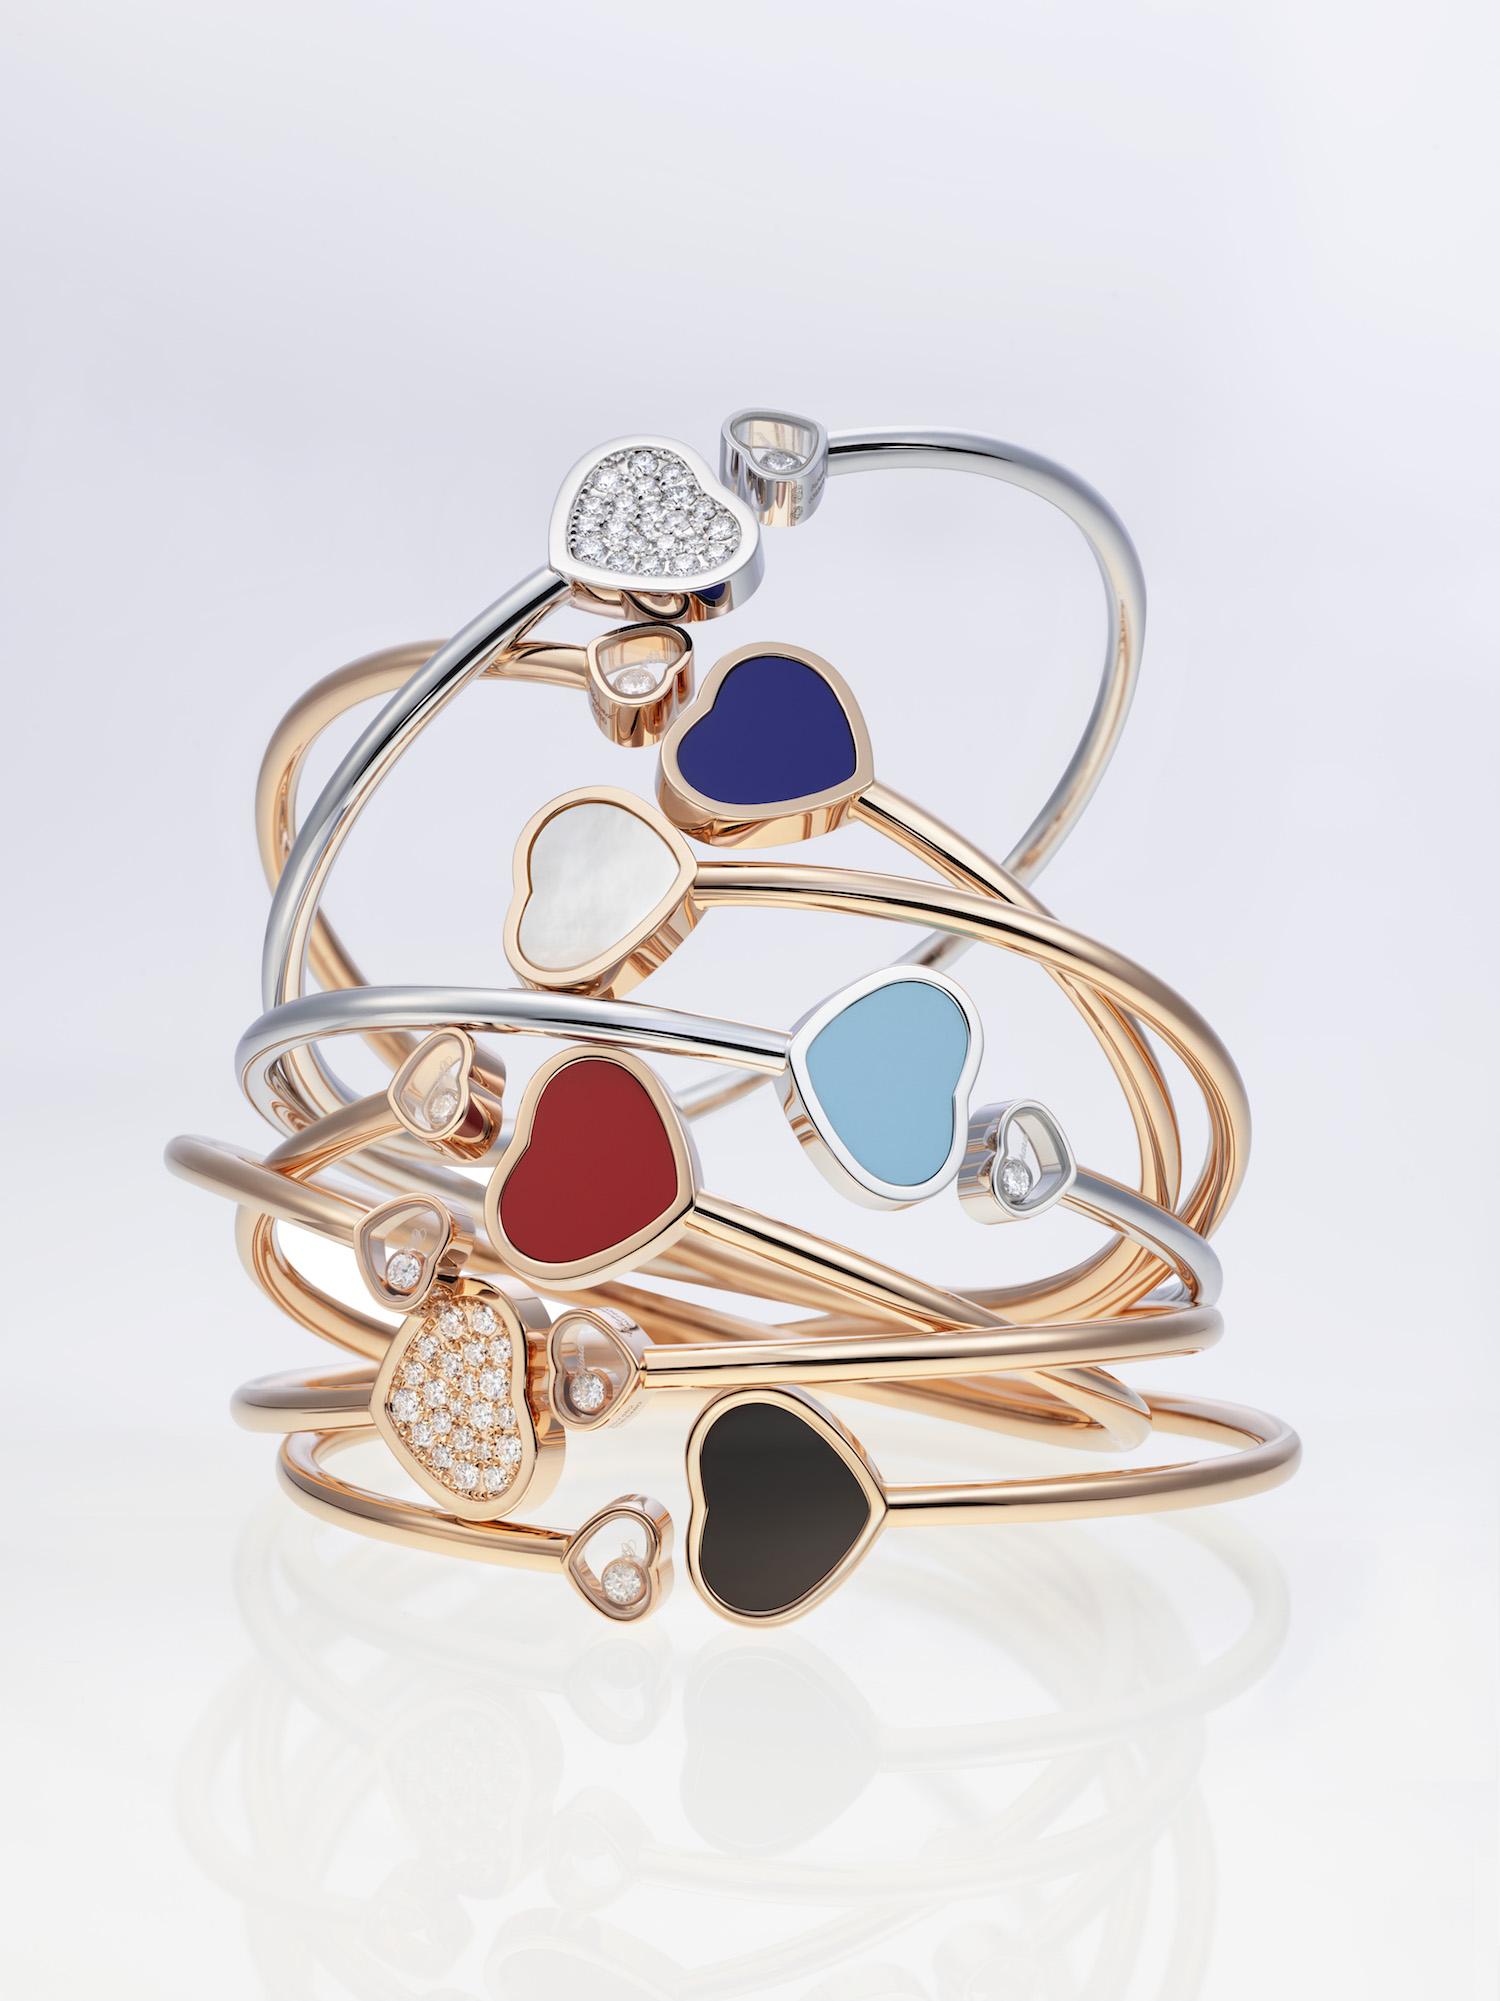 Happy Hearts bangle bracelets lichter bestand